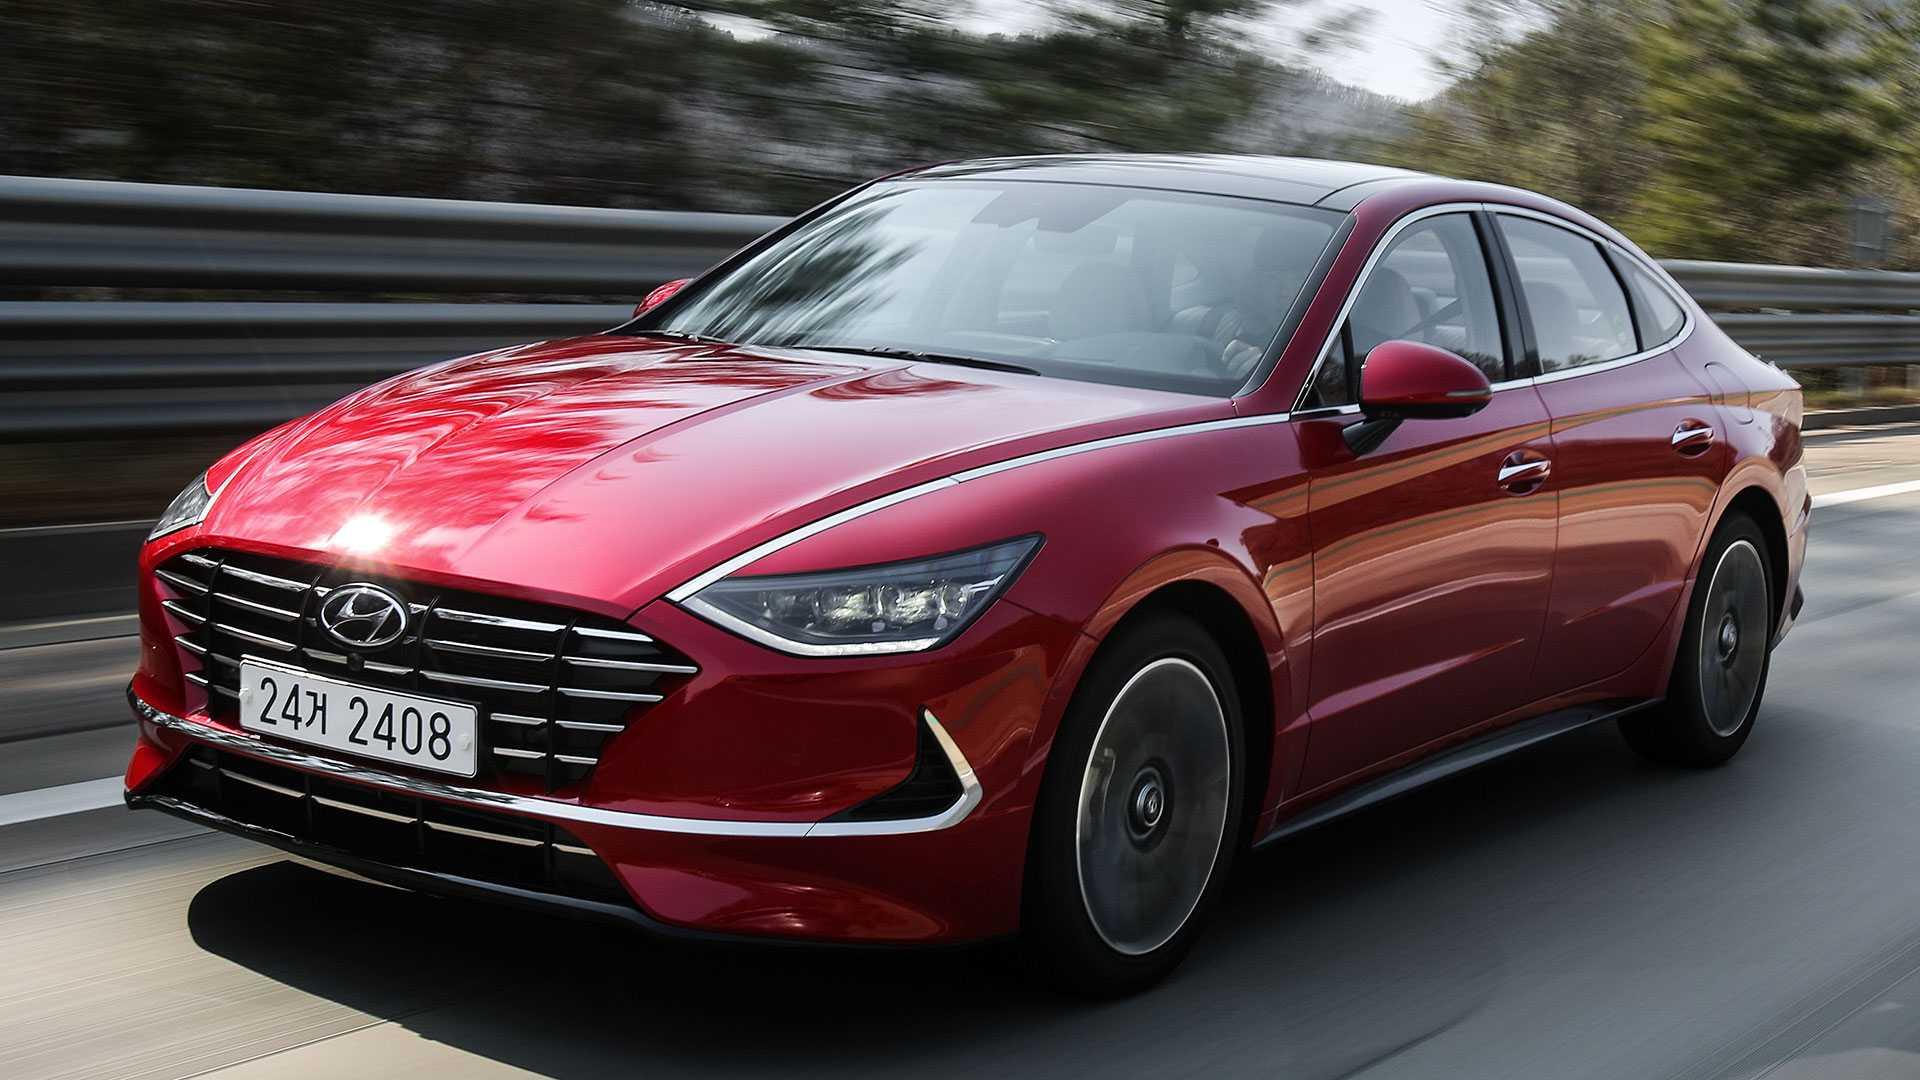 42 New 2020 Hyundai Sonata Redesign Price and Review with 2020 Hyundai Sonata Redesign